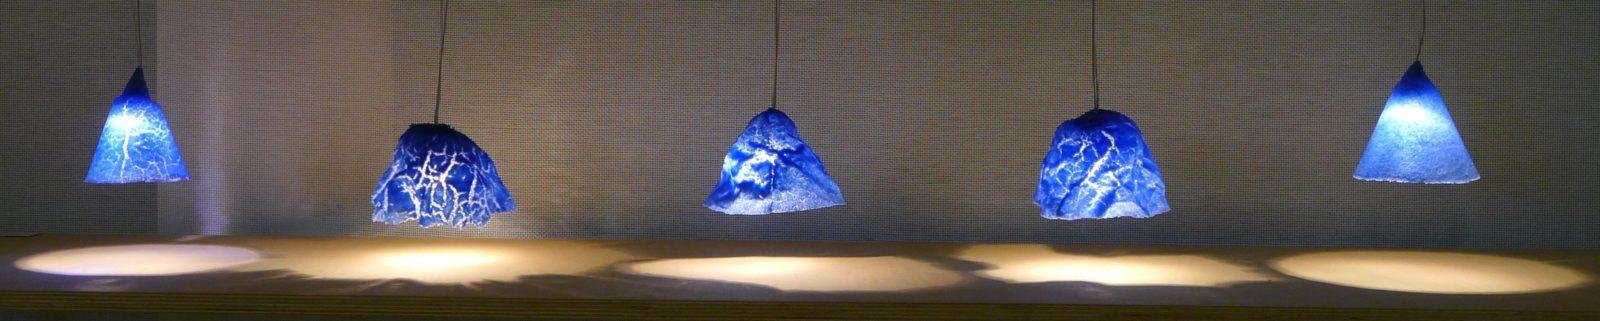 francoise Bolli luminaires bleu